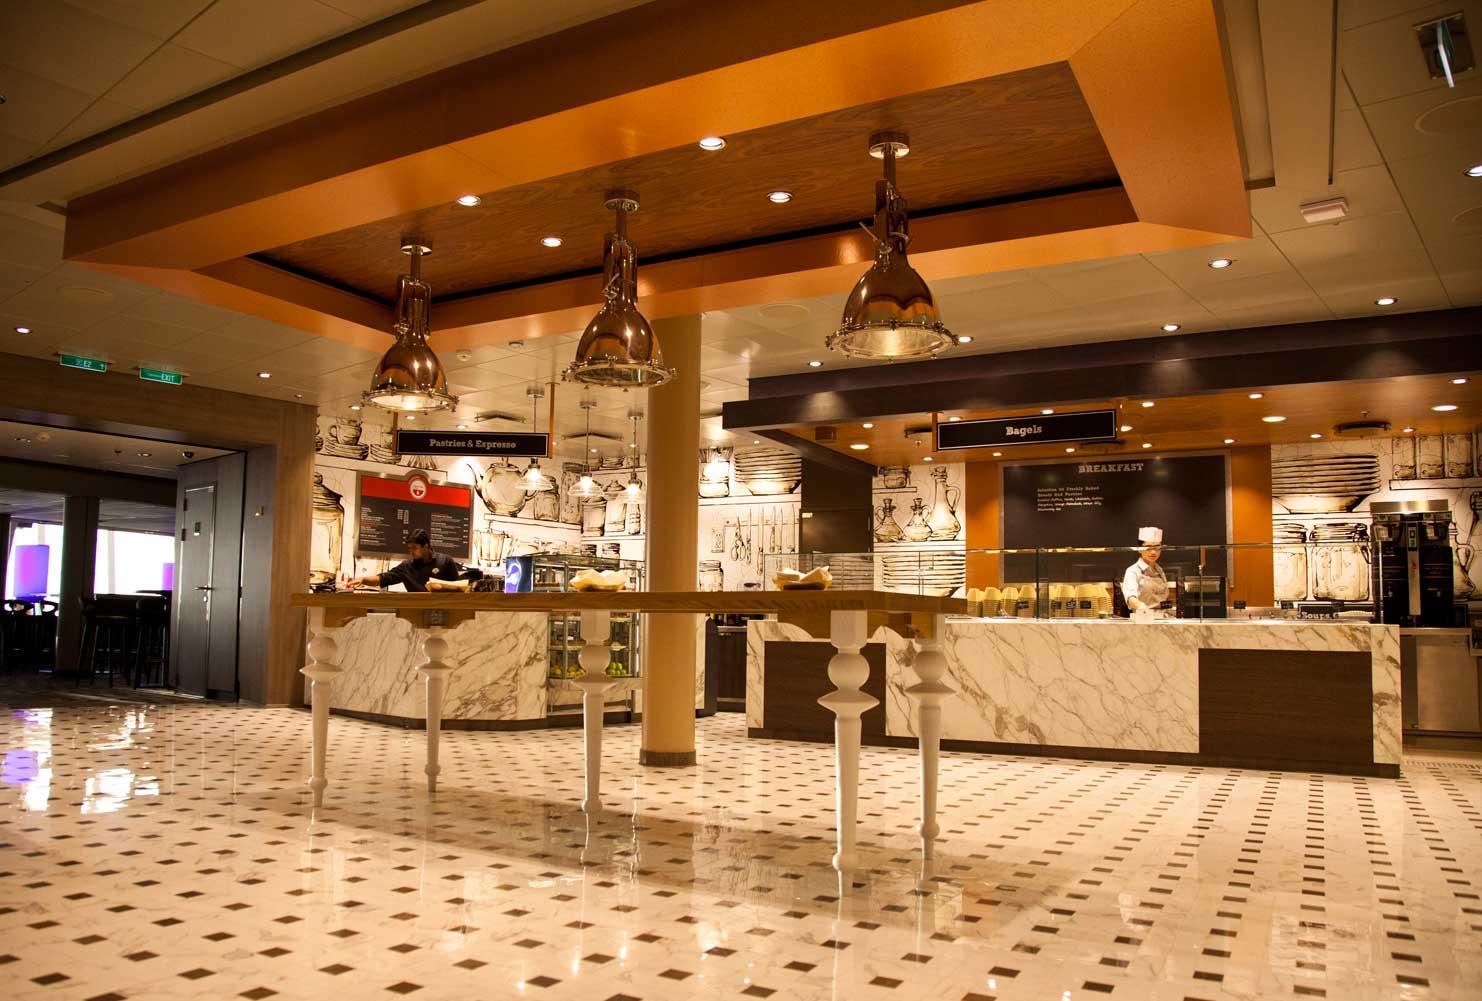 Cafe@270, Ovation of the Seas, Royal Caribbean Cruise Line